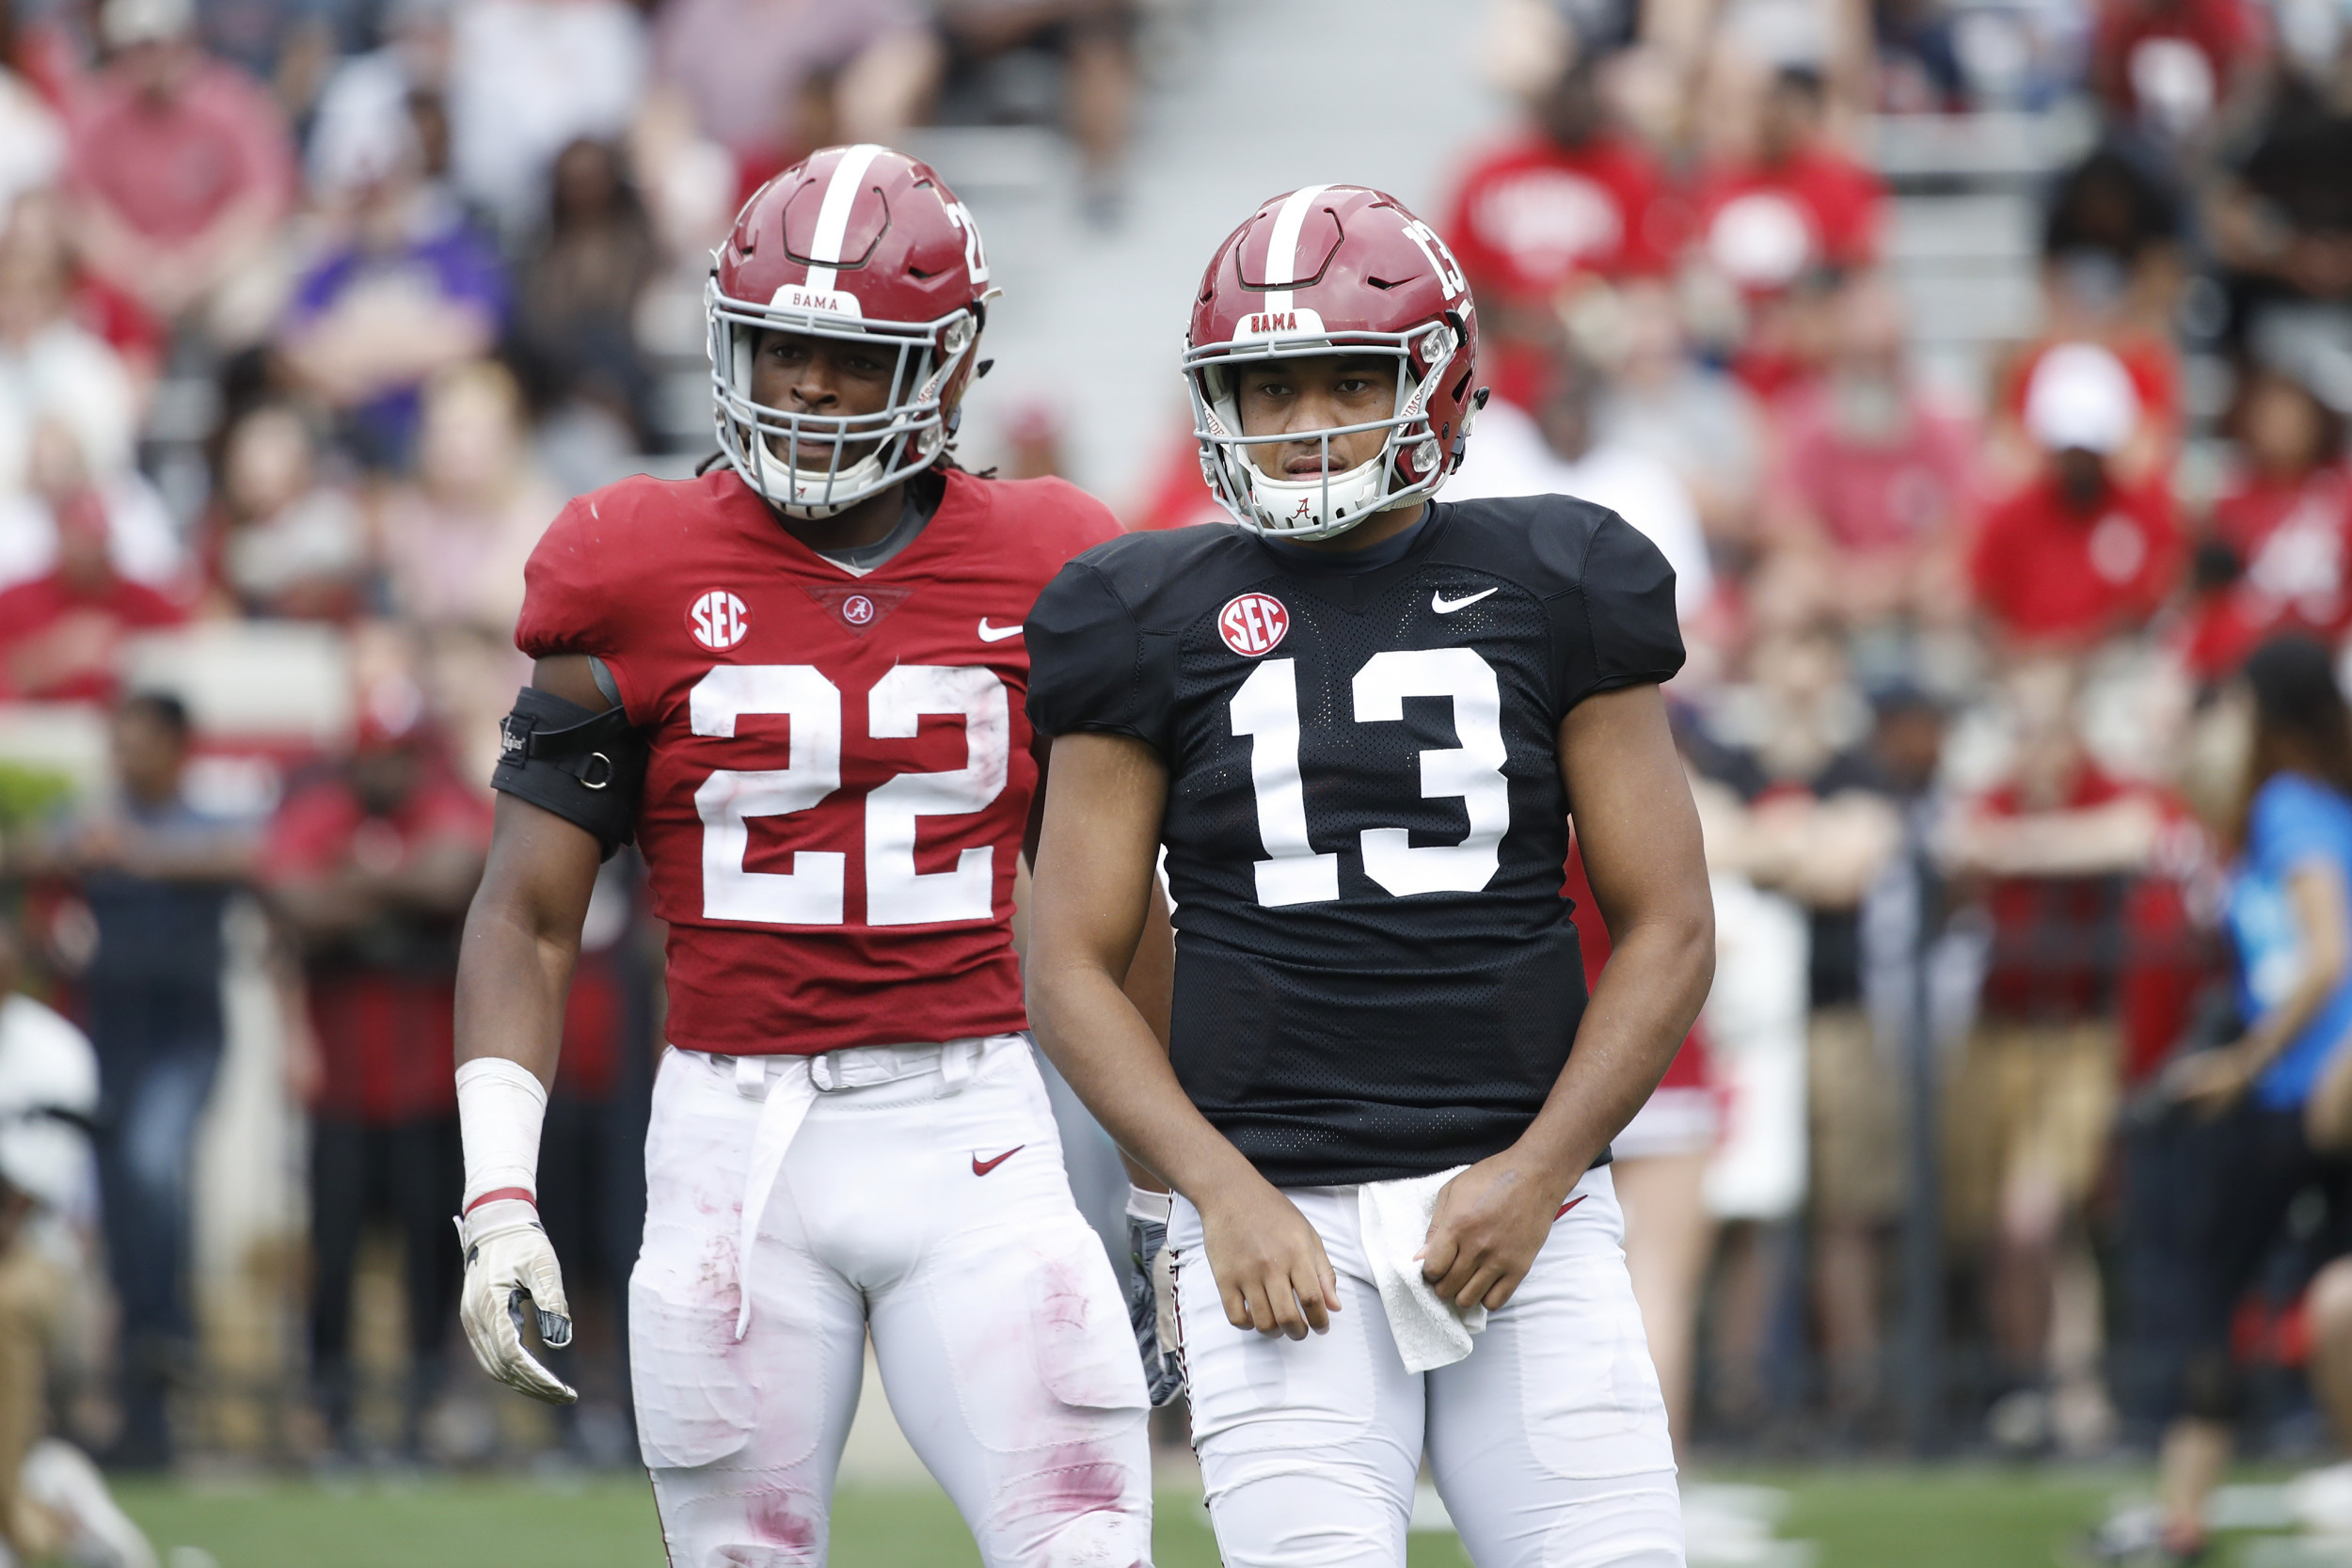 College Football 2019: Where to Watch Duke vs  Alabama, TV